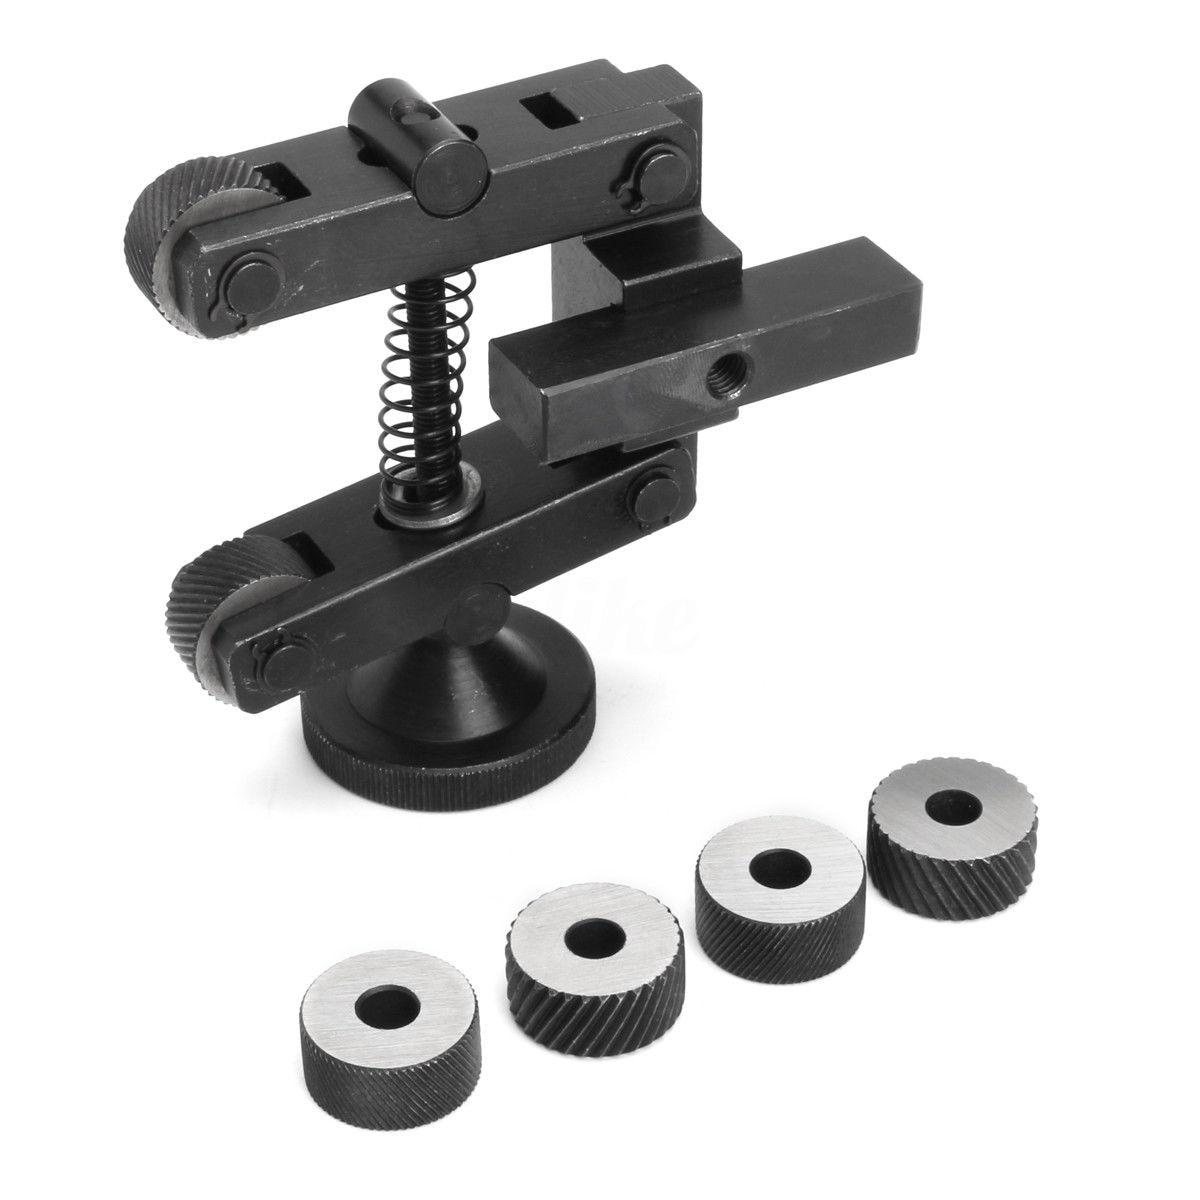 Mayitr Carbon Steel Knurling Tool Holder Linear Knurl Tools Adjustable Shank 6pcs Wheel 20mm For Mini